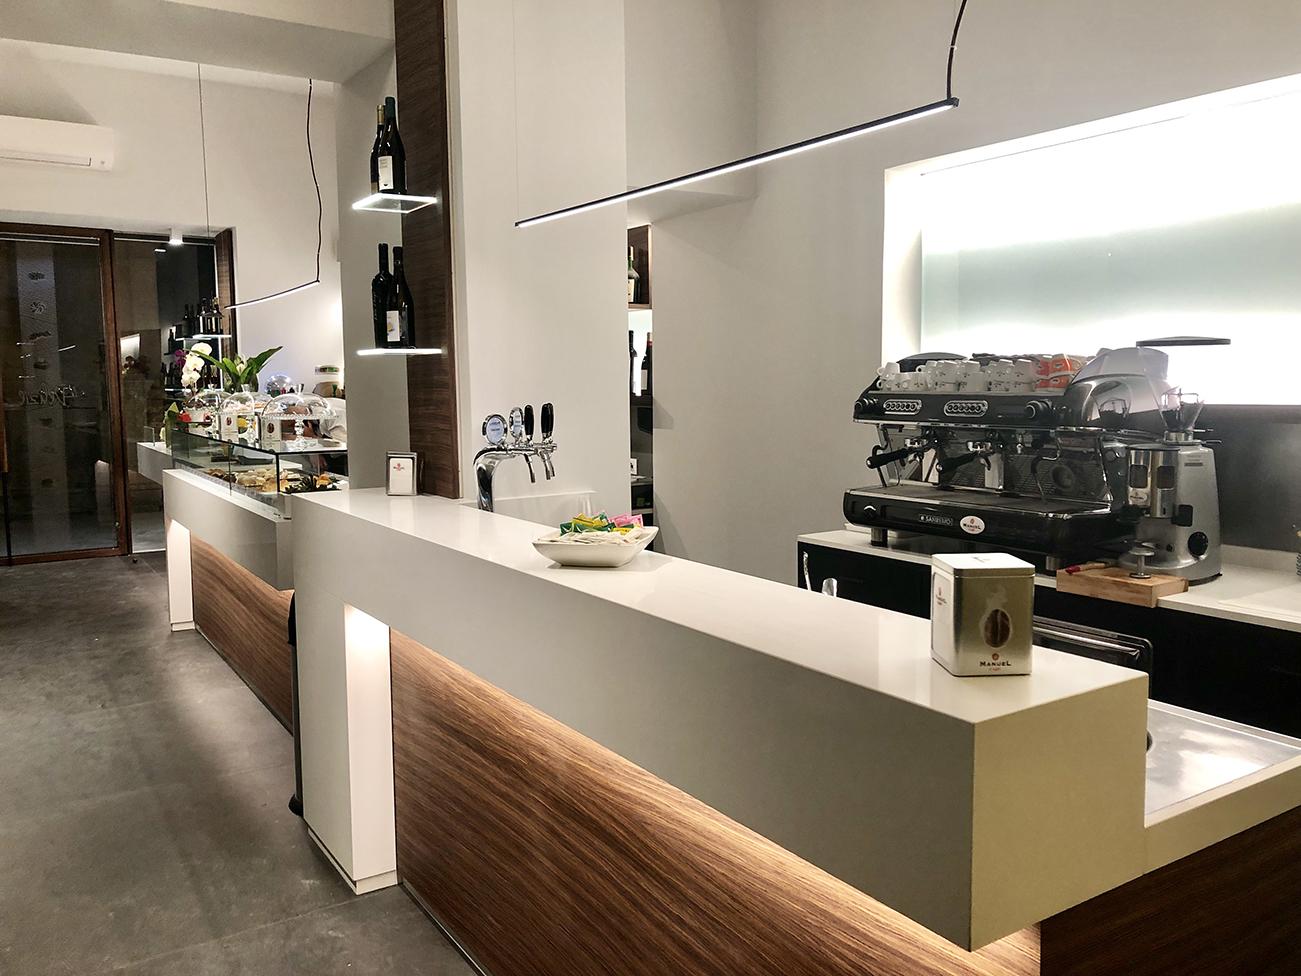 Arredi Bar Moderni cusumano falegnami marsala - arredamento moderno bar